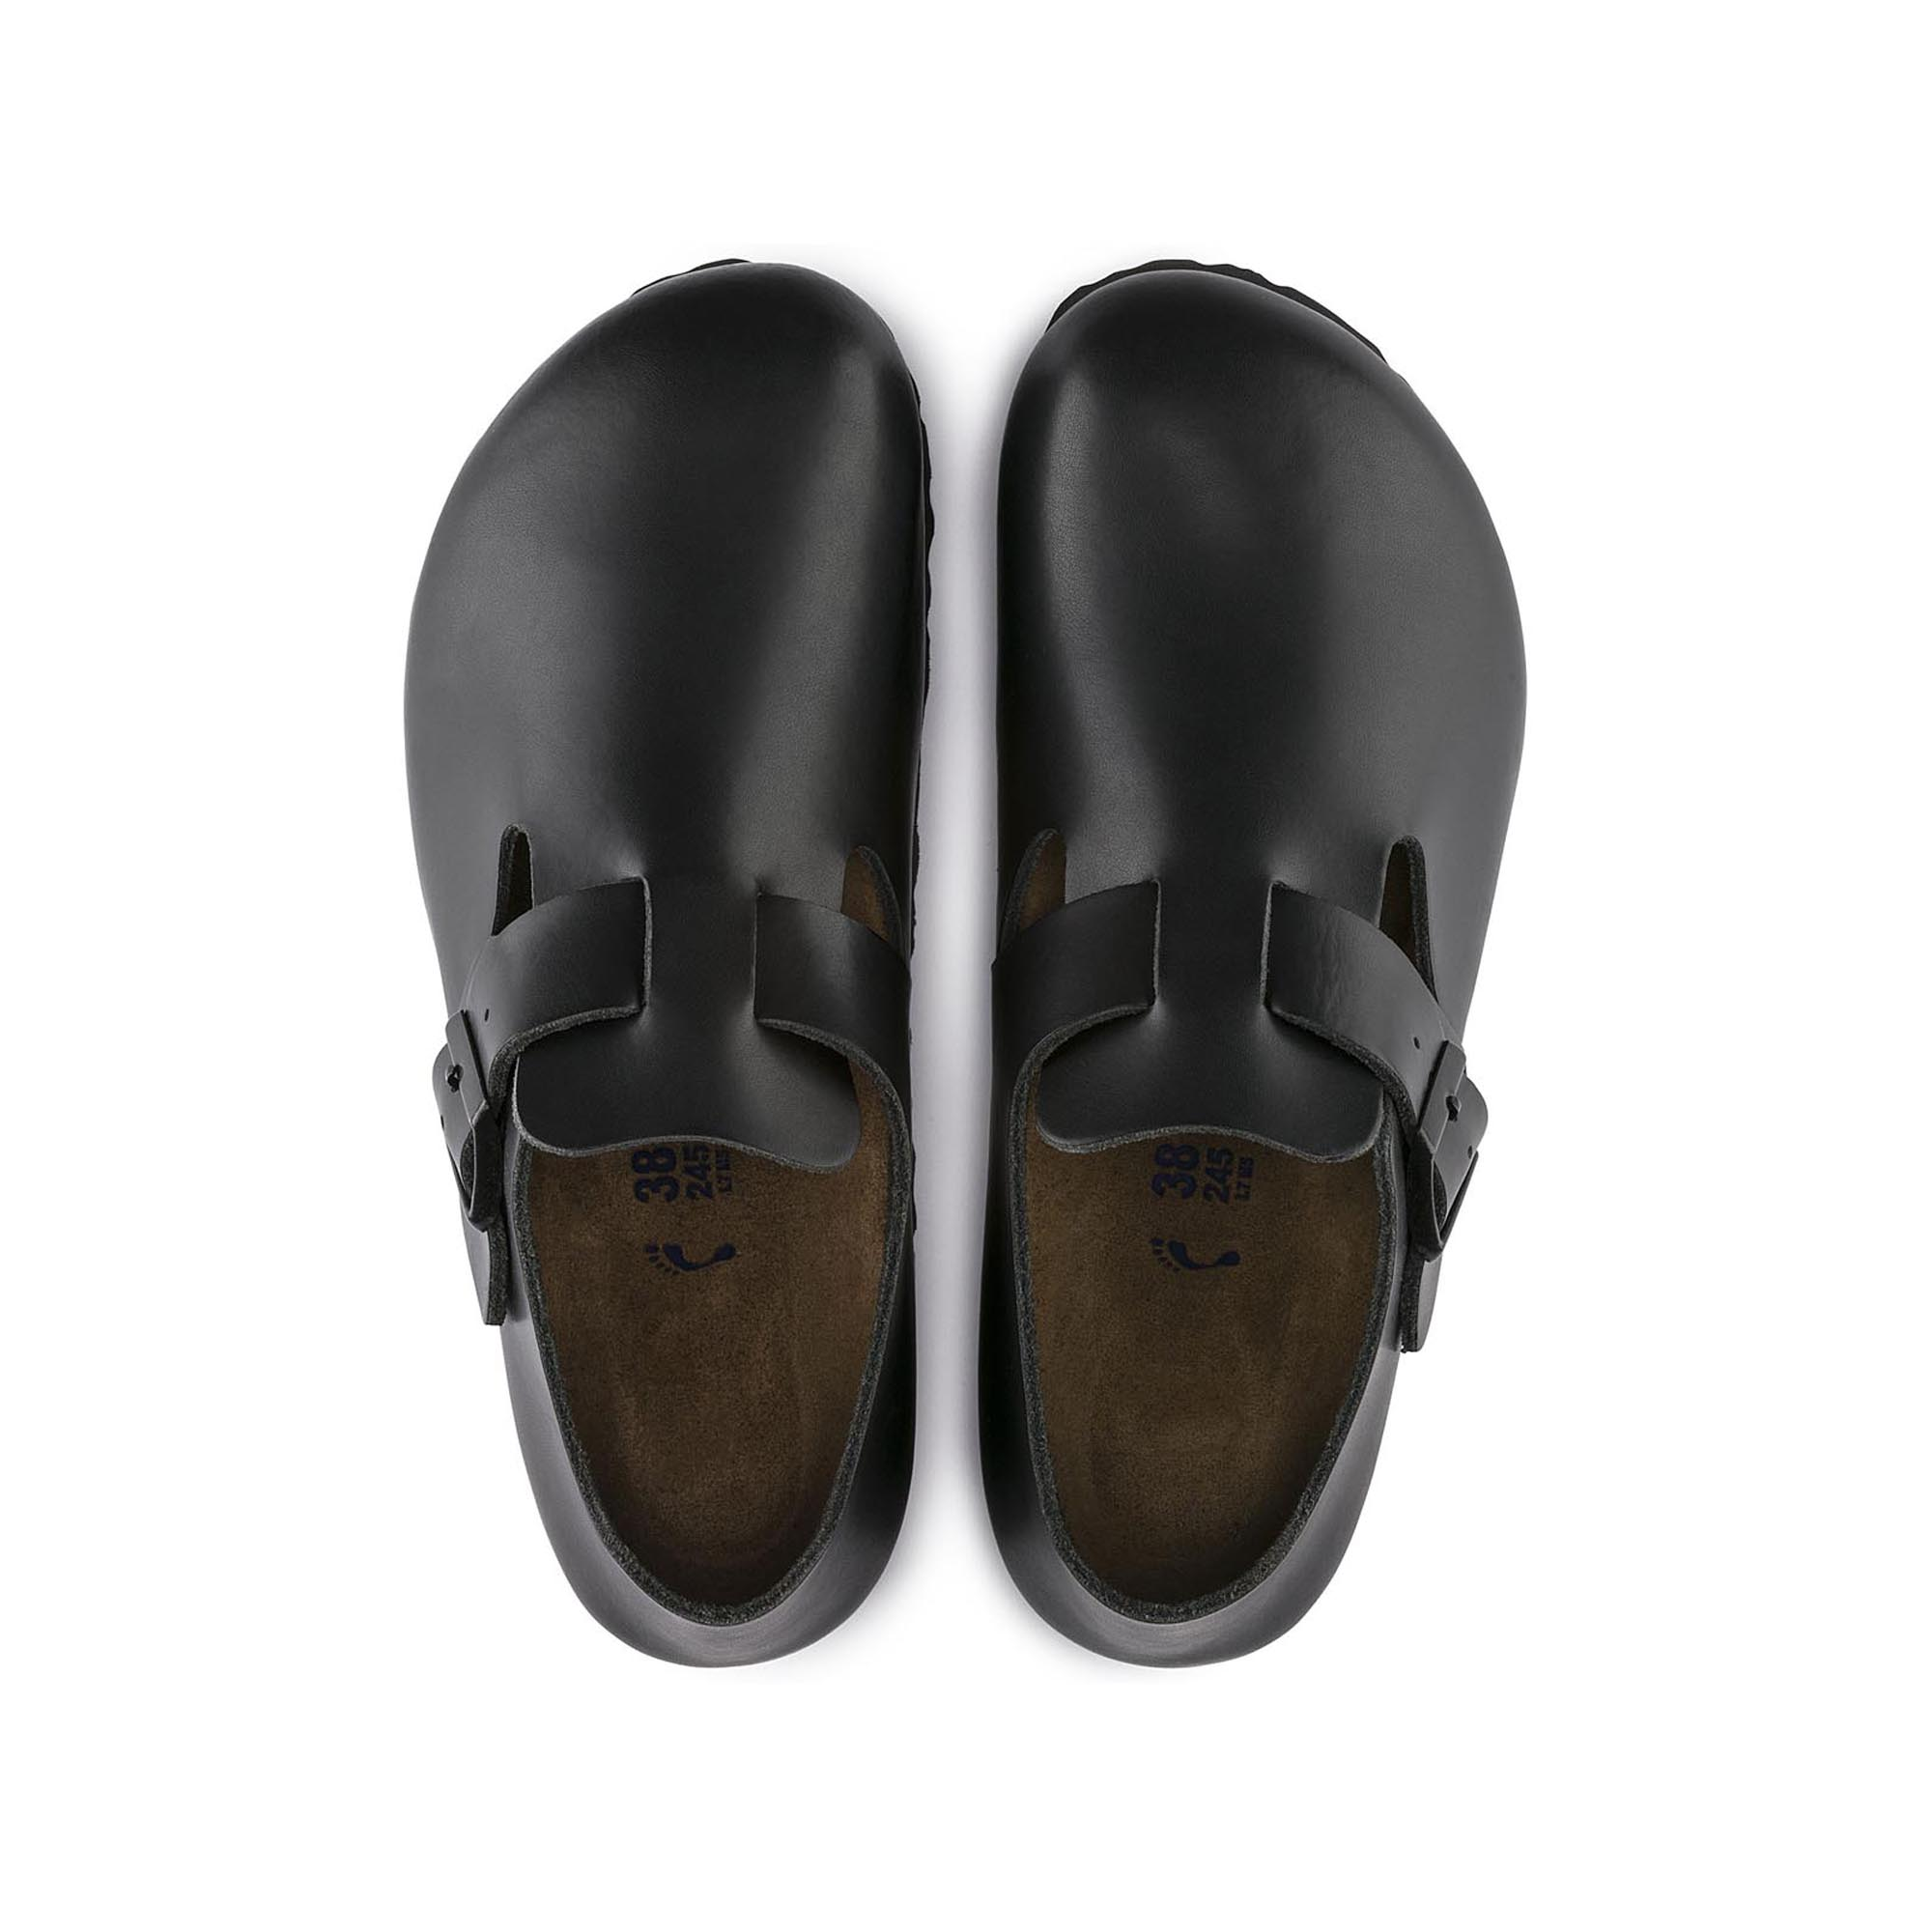 Birkenstock London soft footbed Size 40 narrow